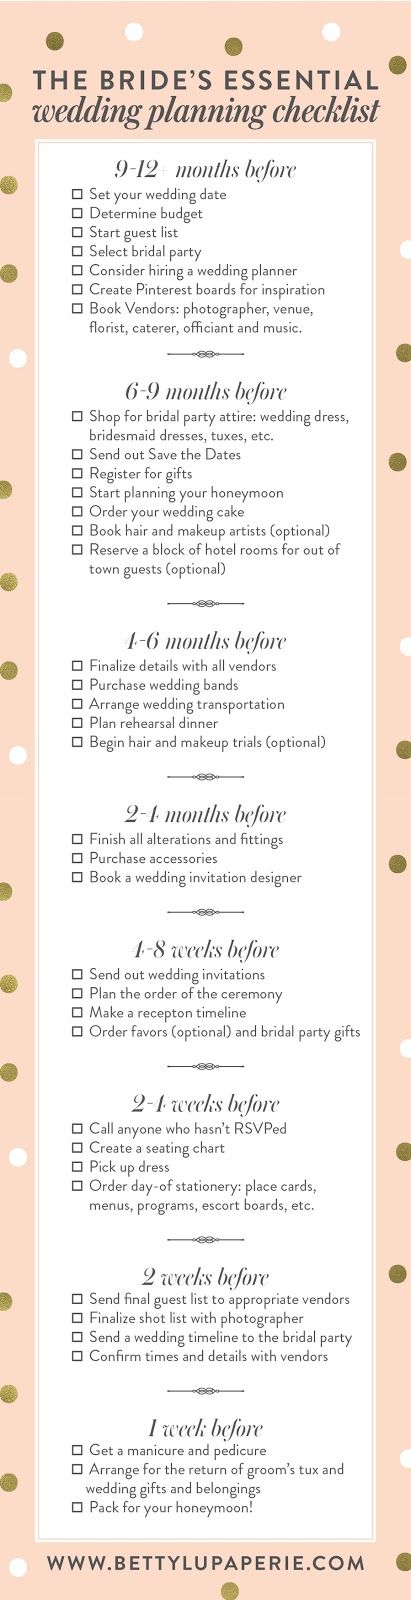 The Essential Wedding Planning Checklist - Betty Lu Paperie